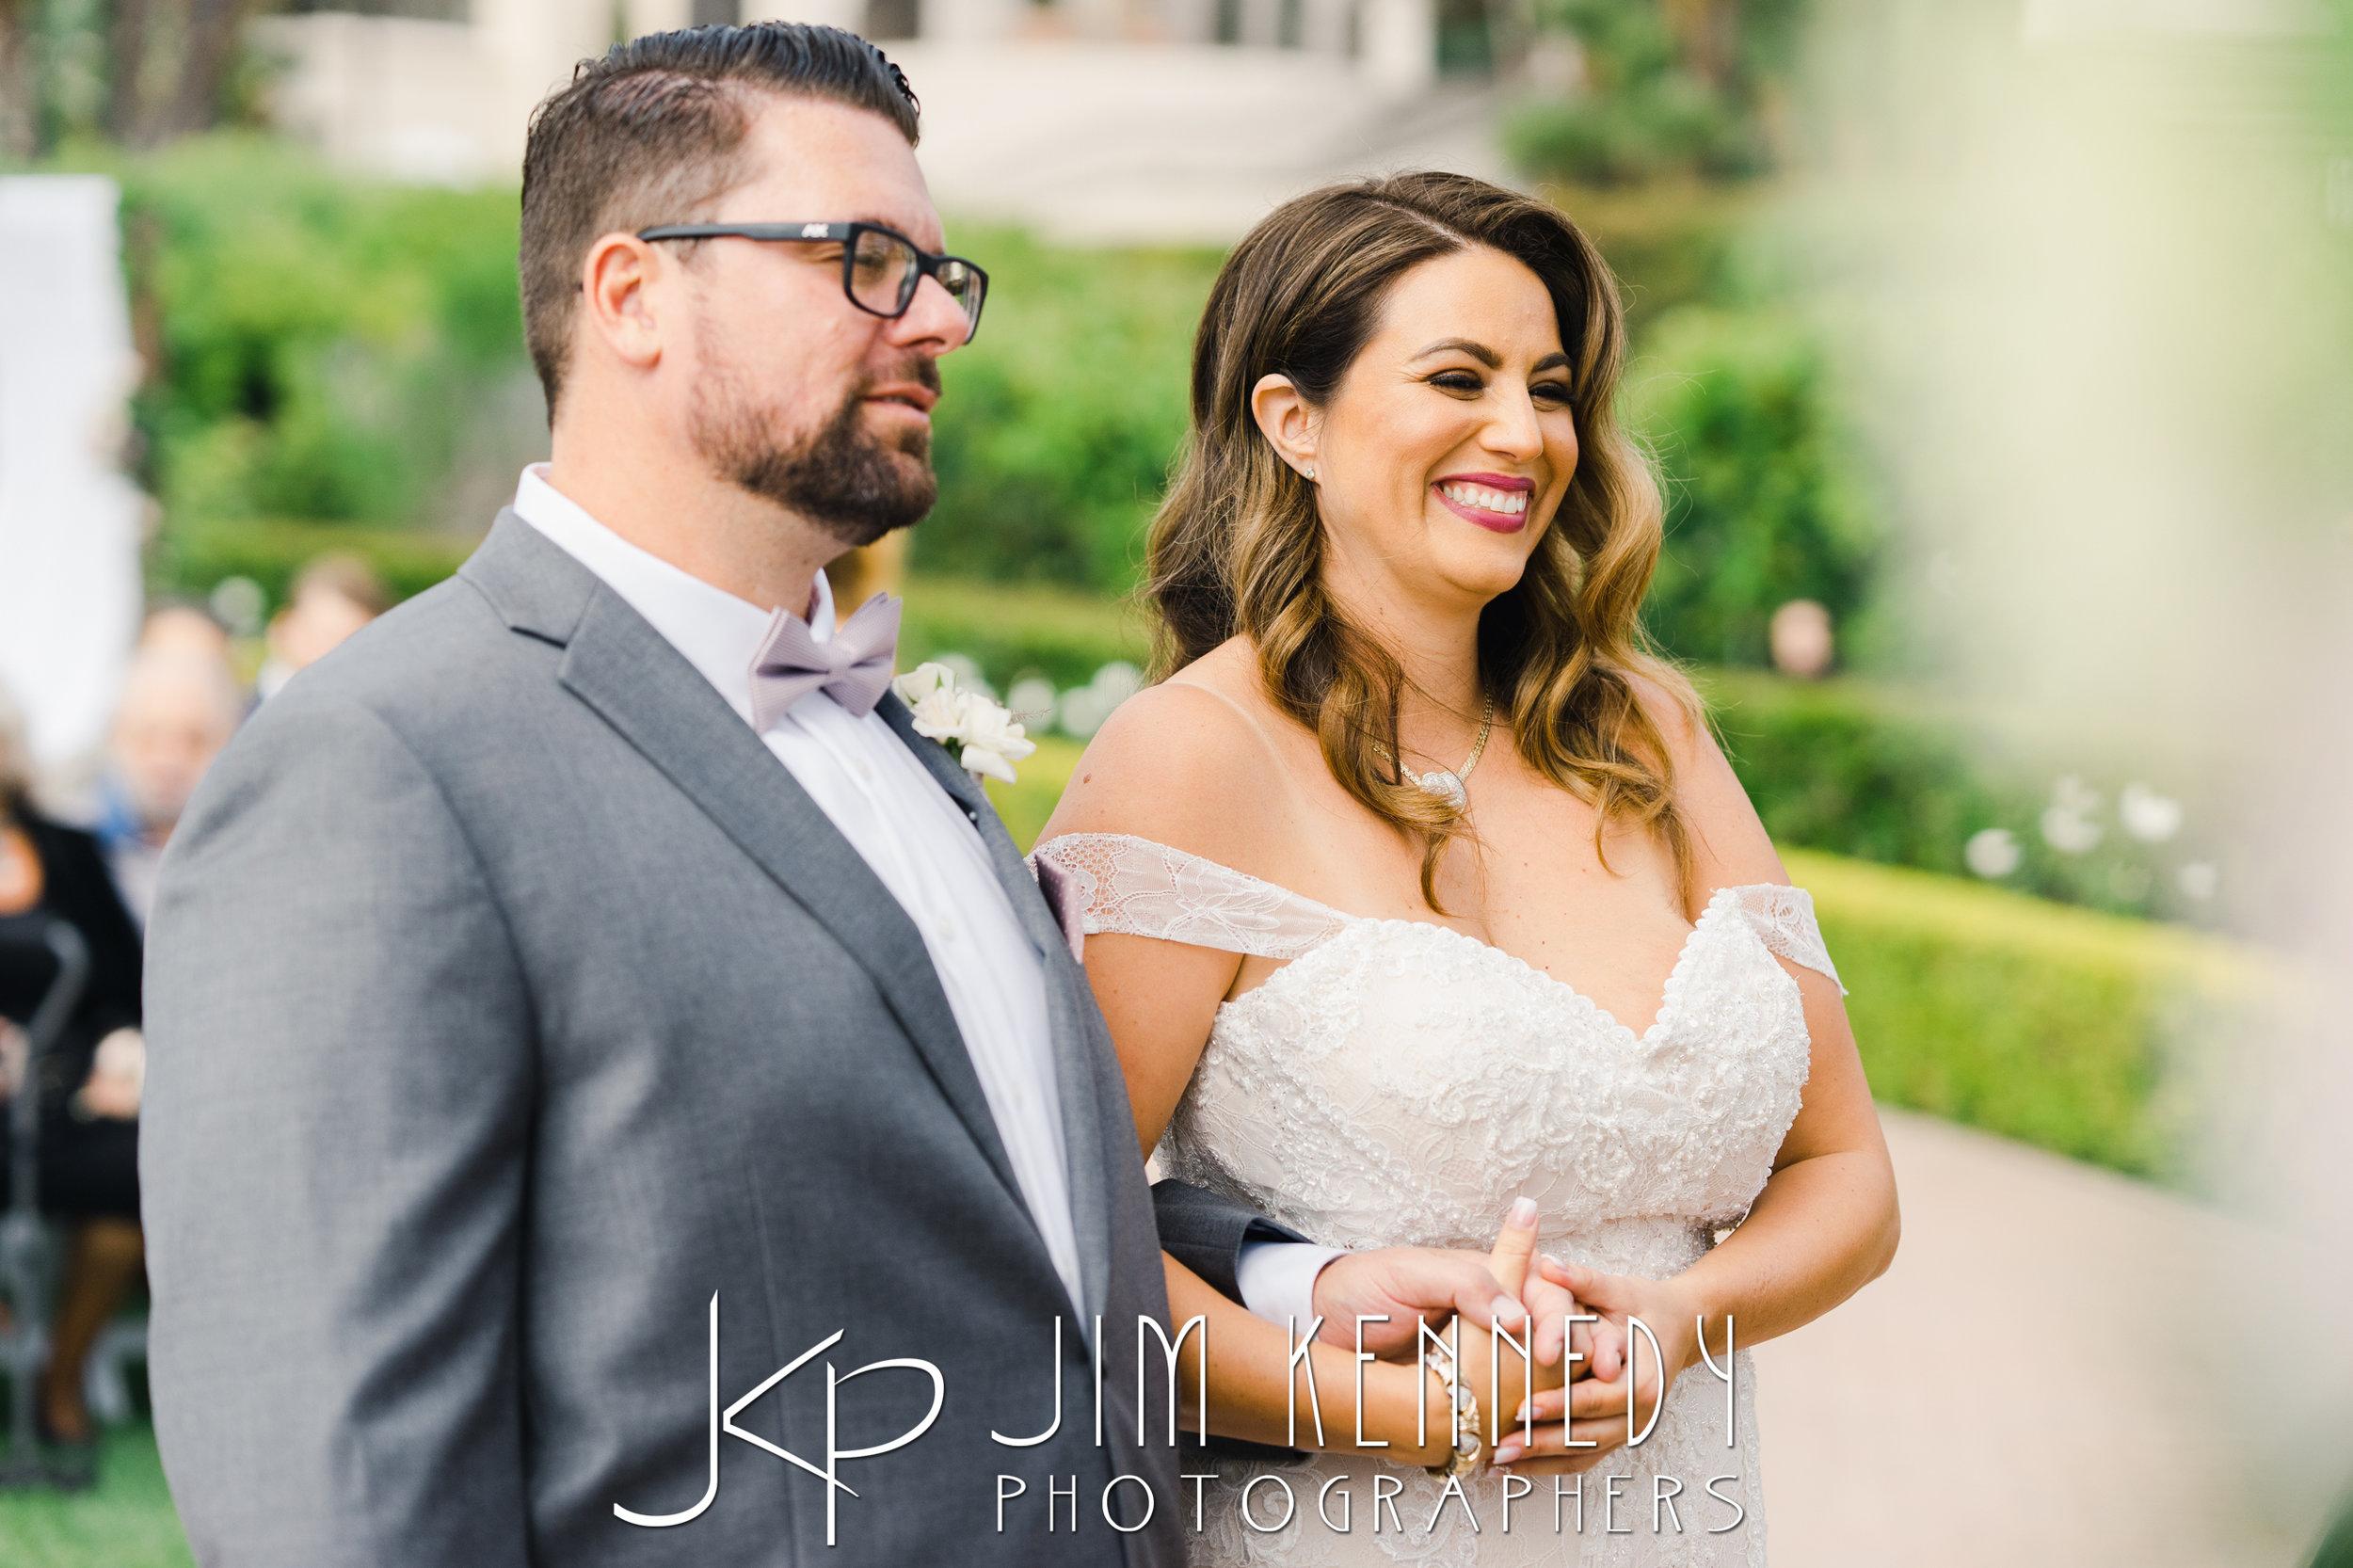 pelican-hill-wedding-jim-kenedy-photographers_0117.JPG